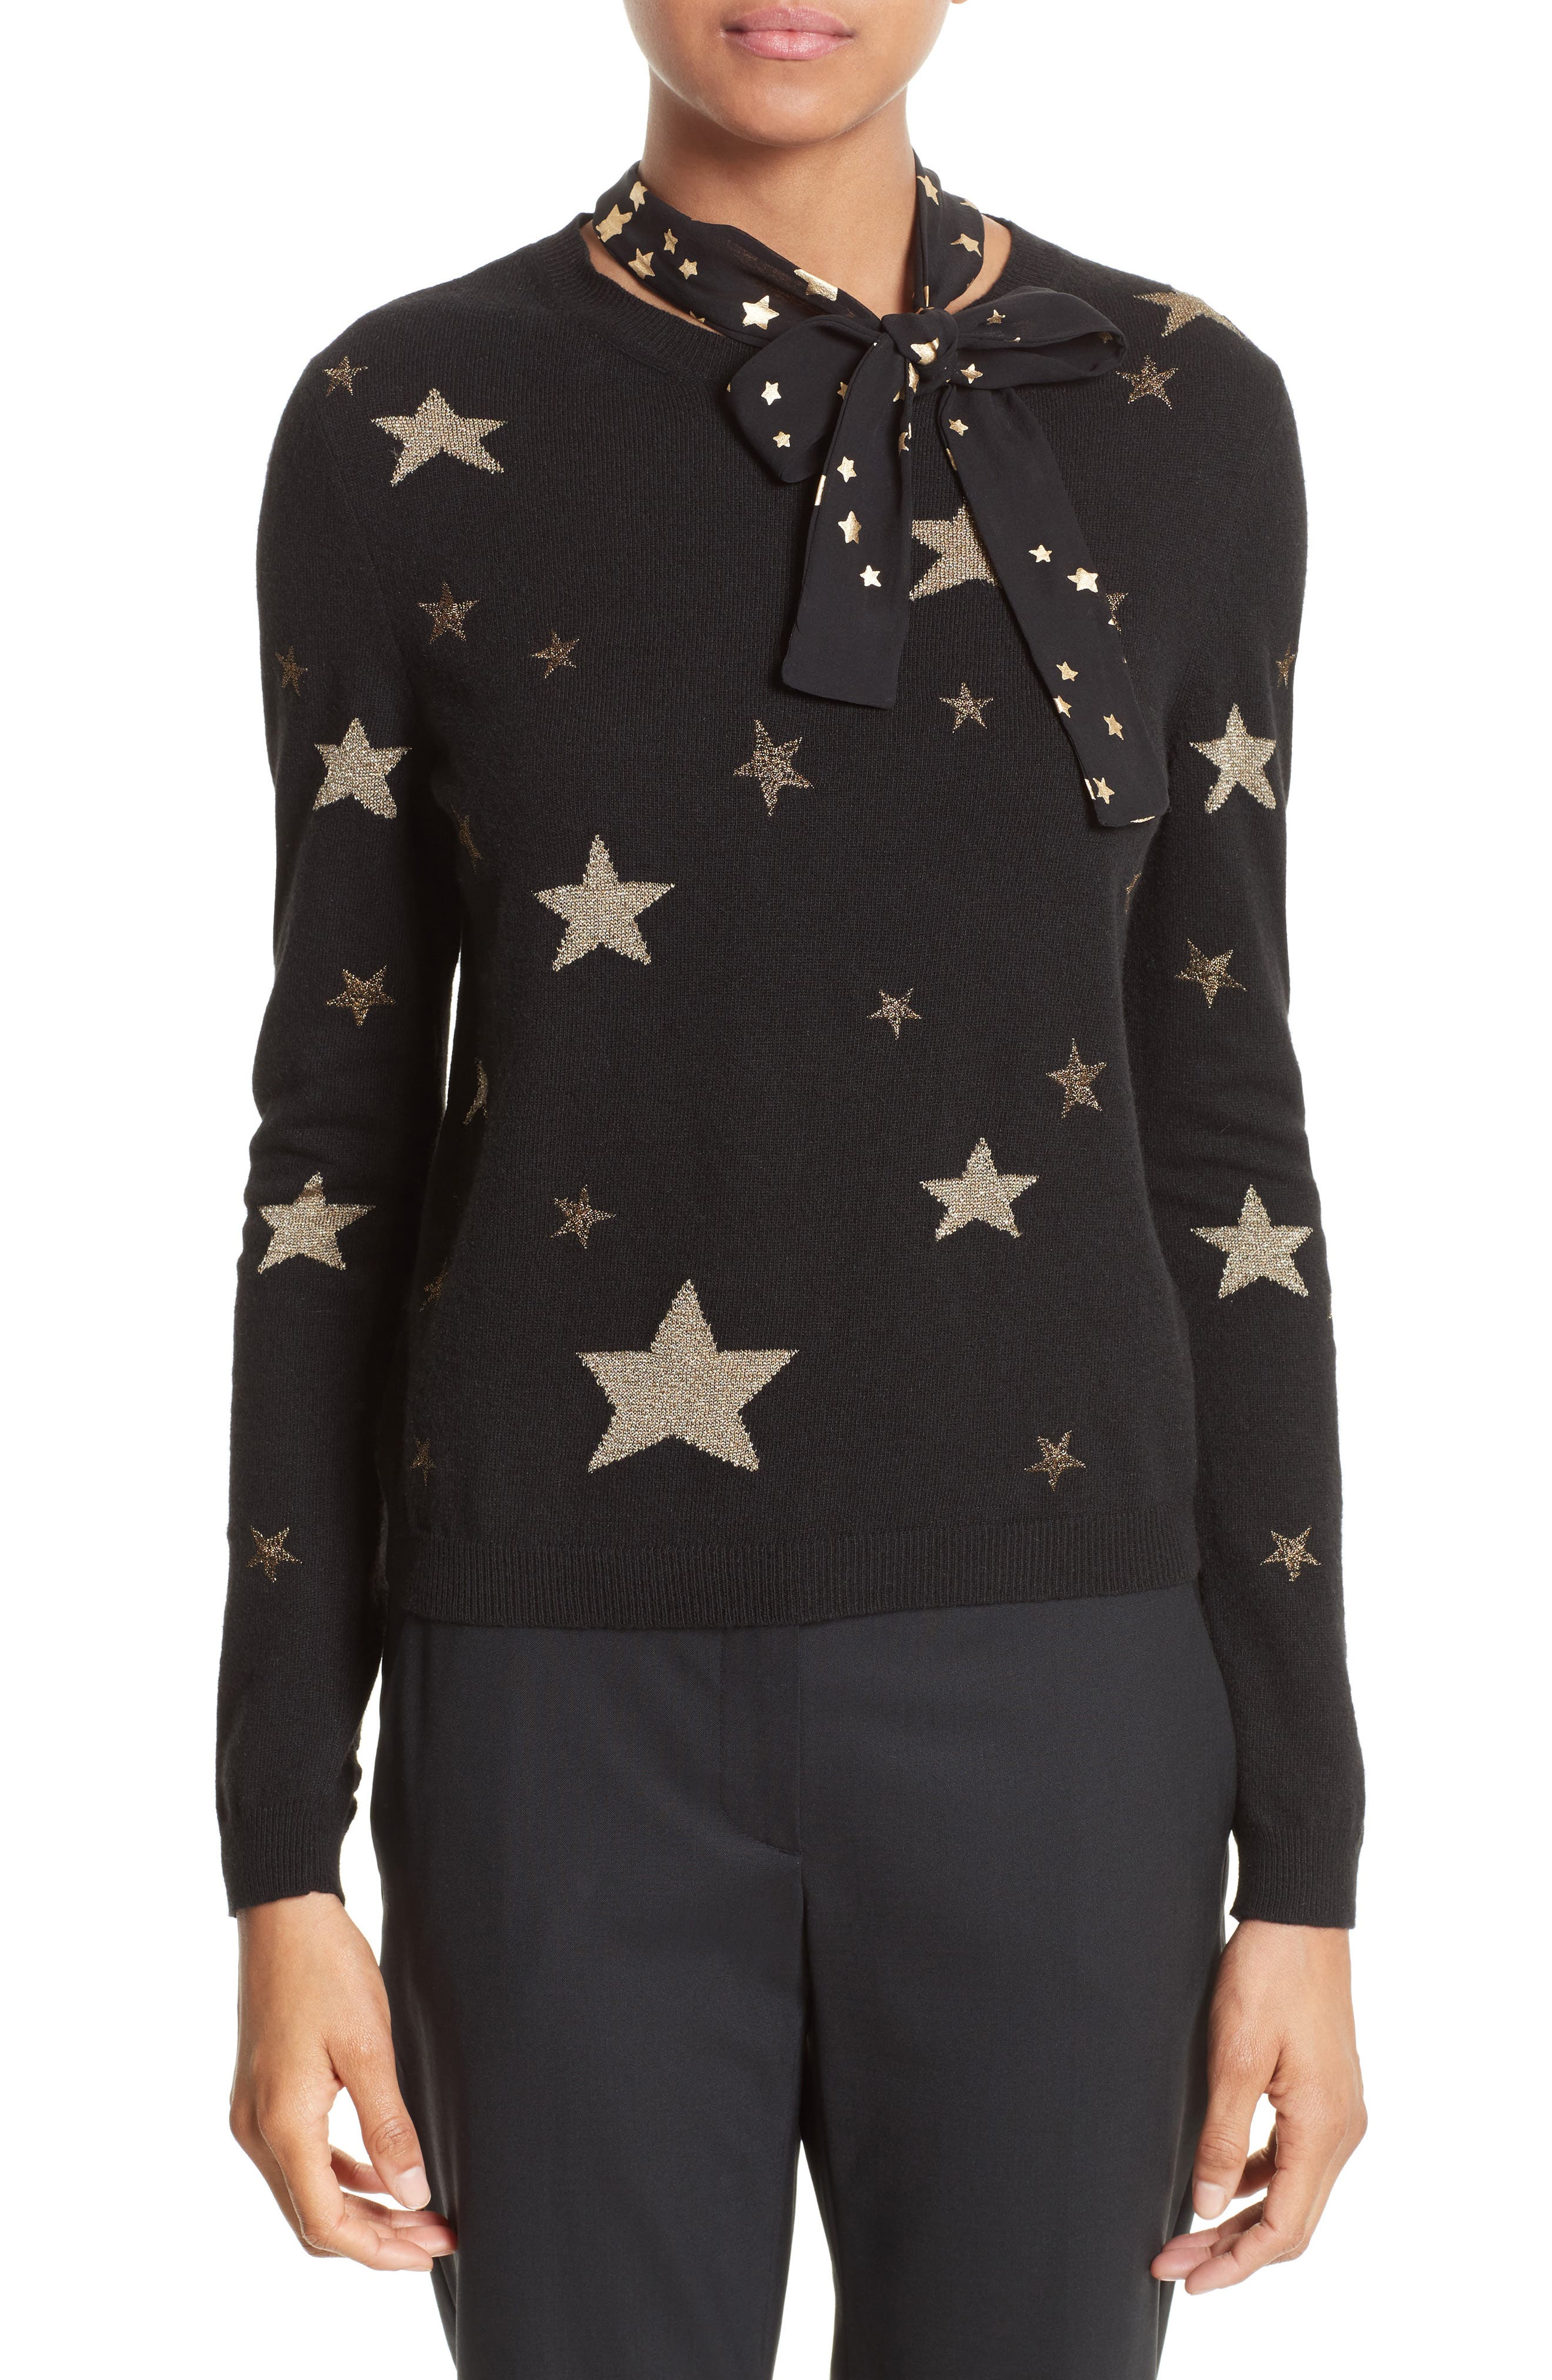 Main Image - RED Valentino Tie Neck Star Sweater